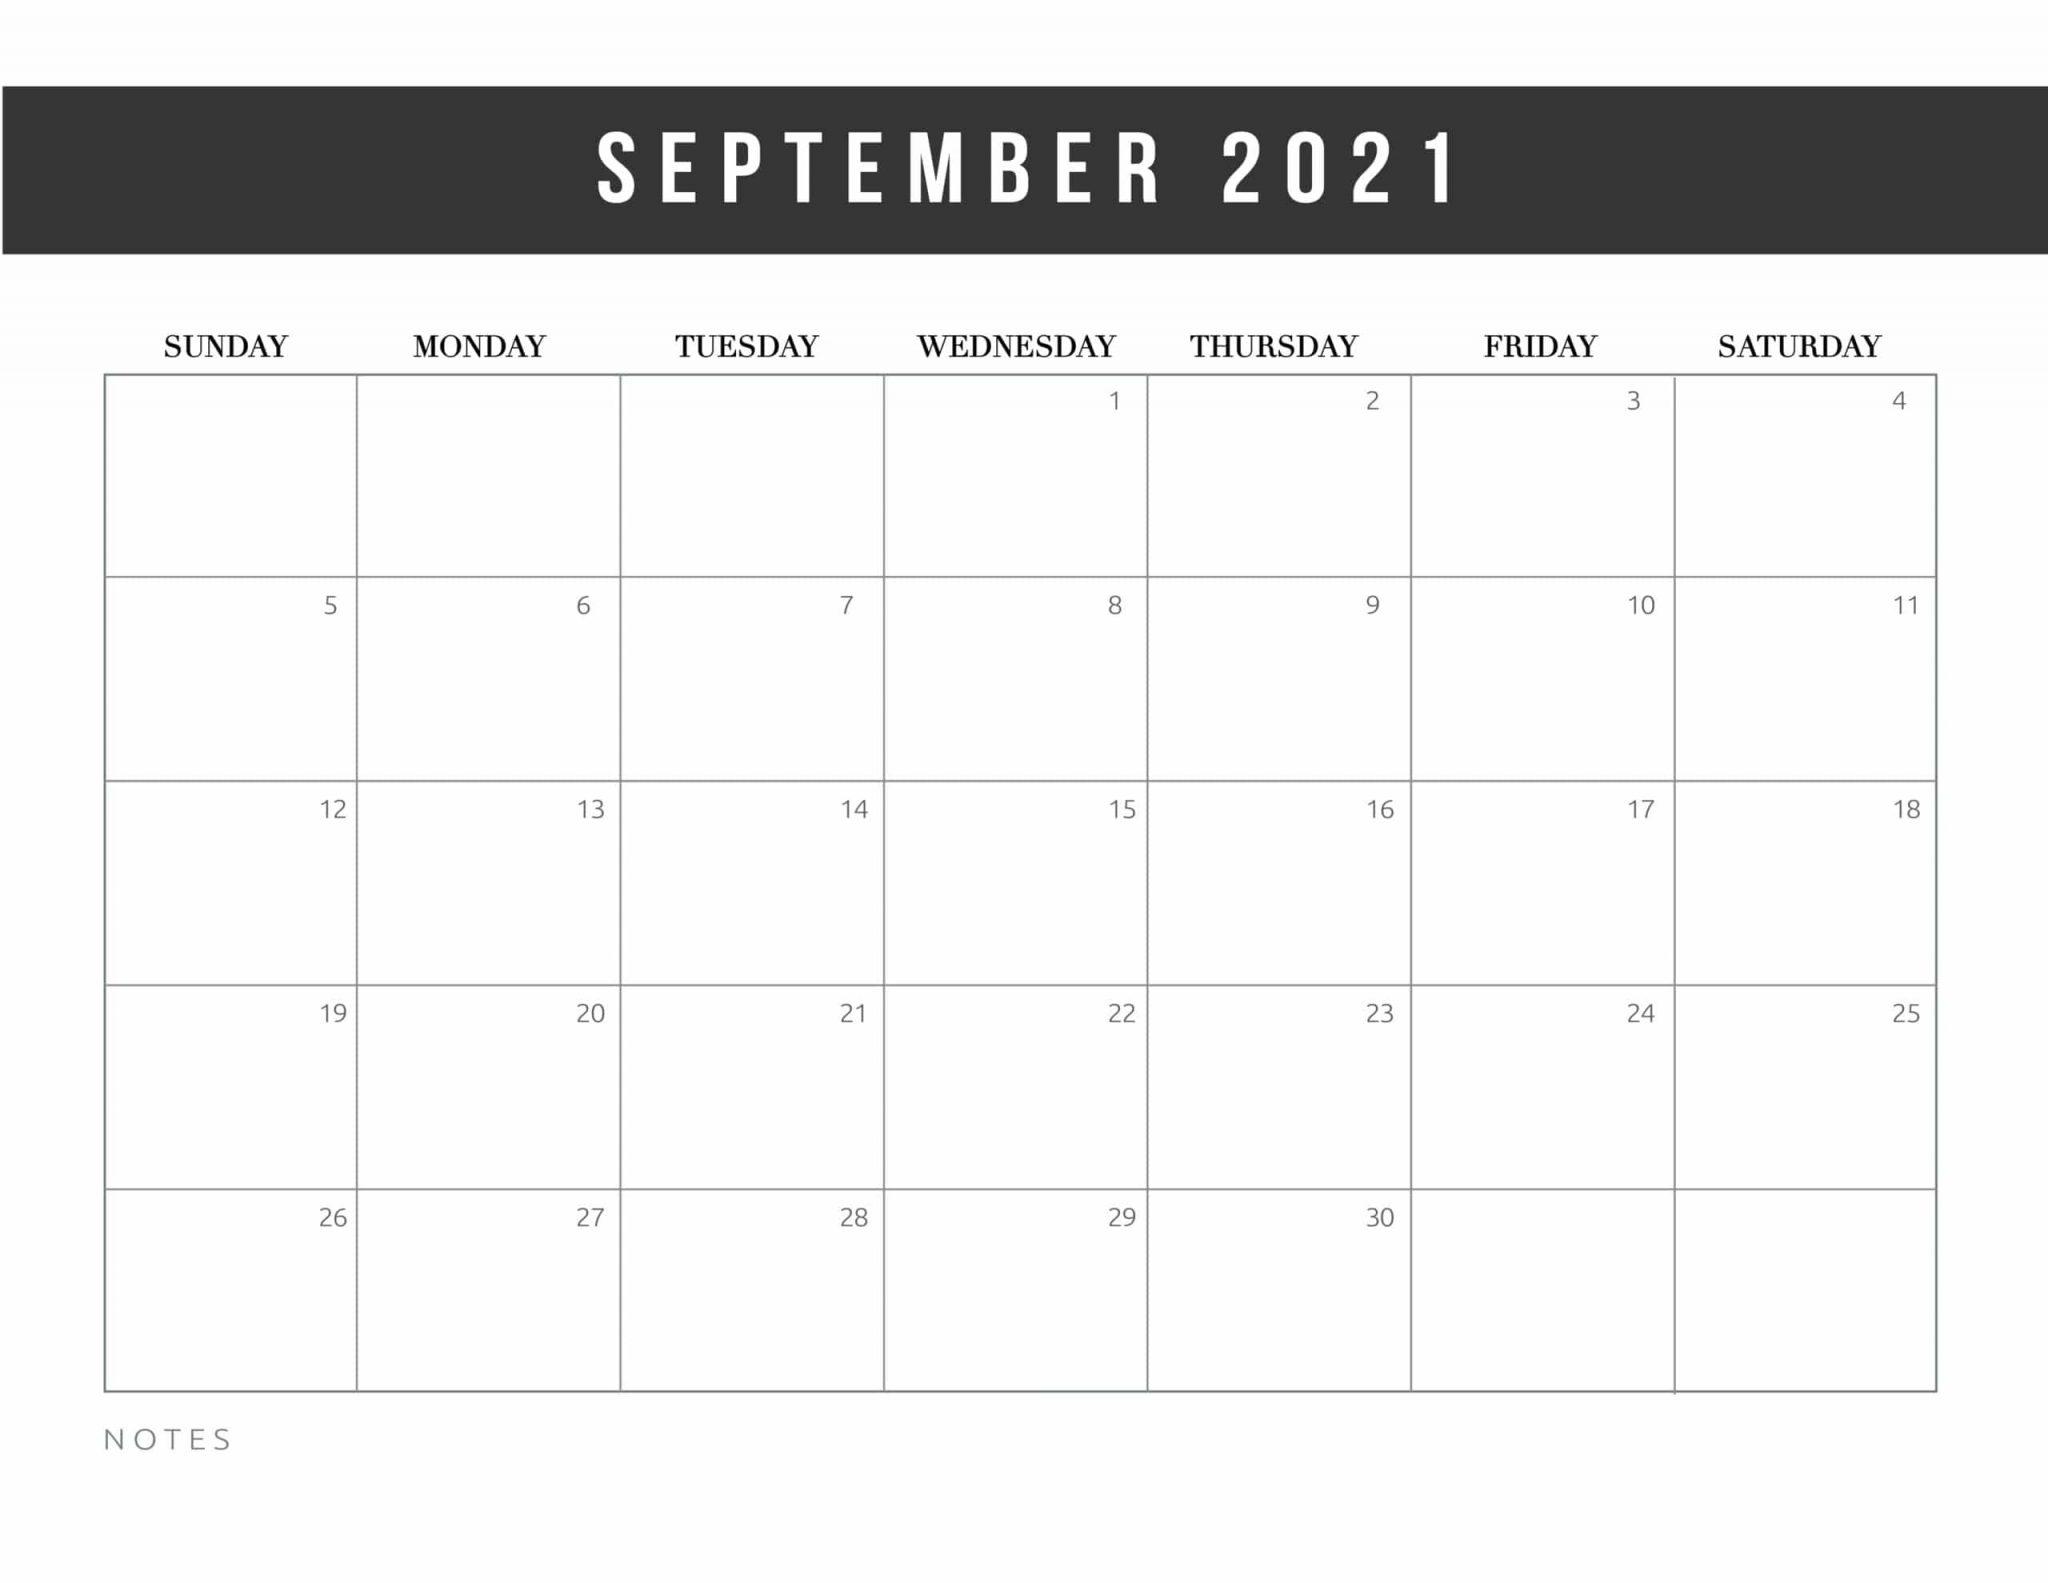 Free september calendar 2021 template